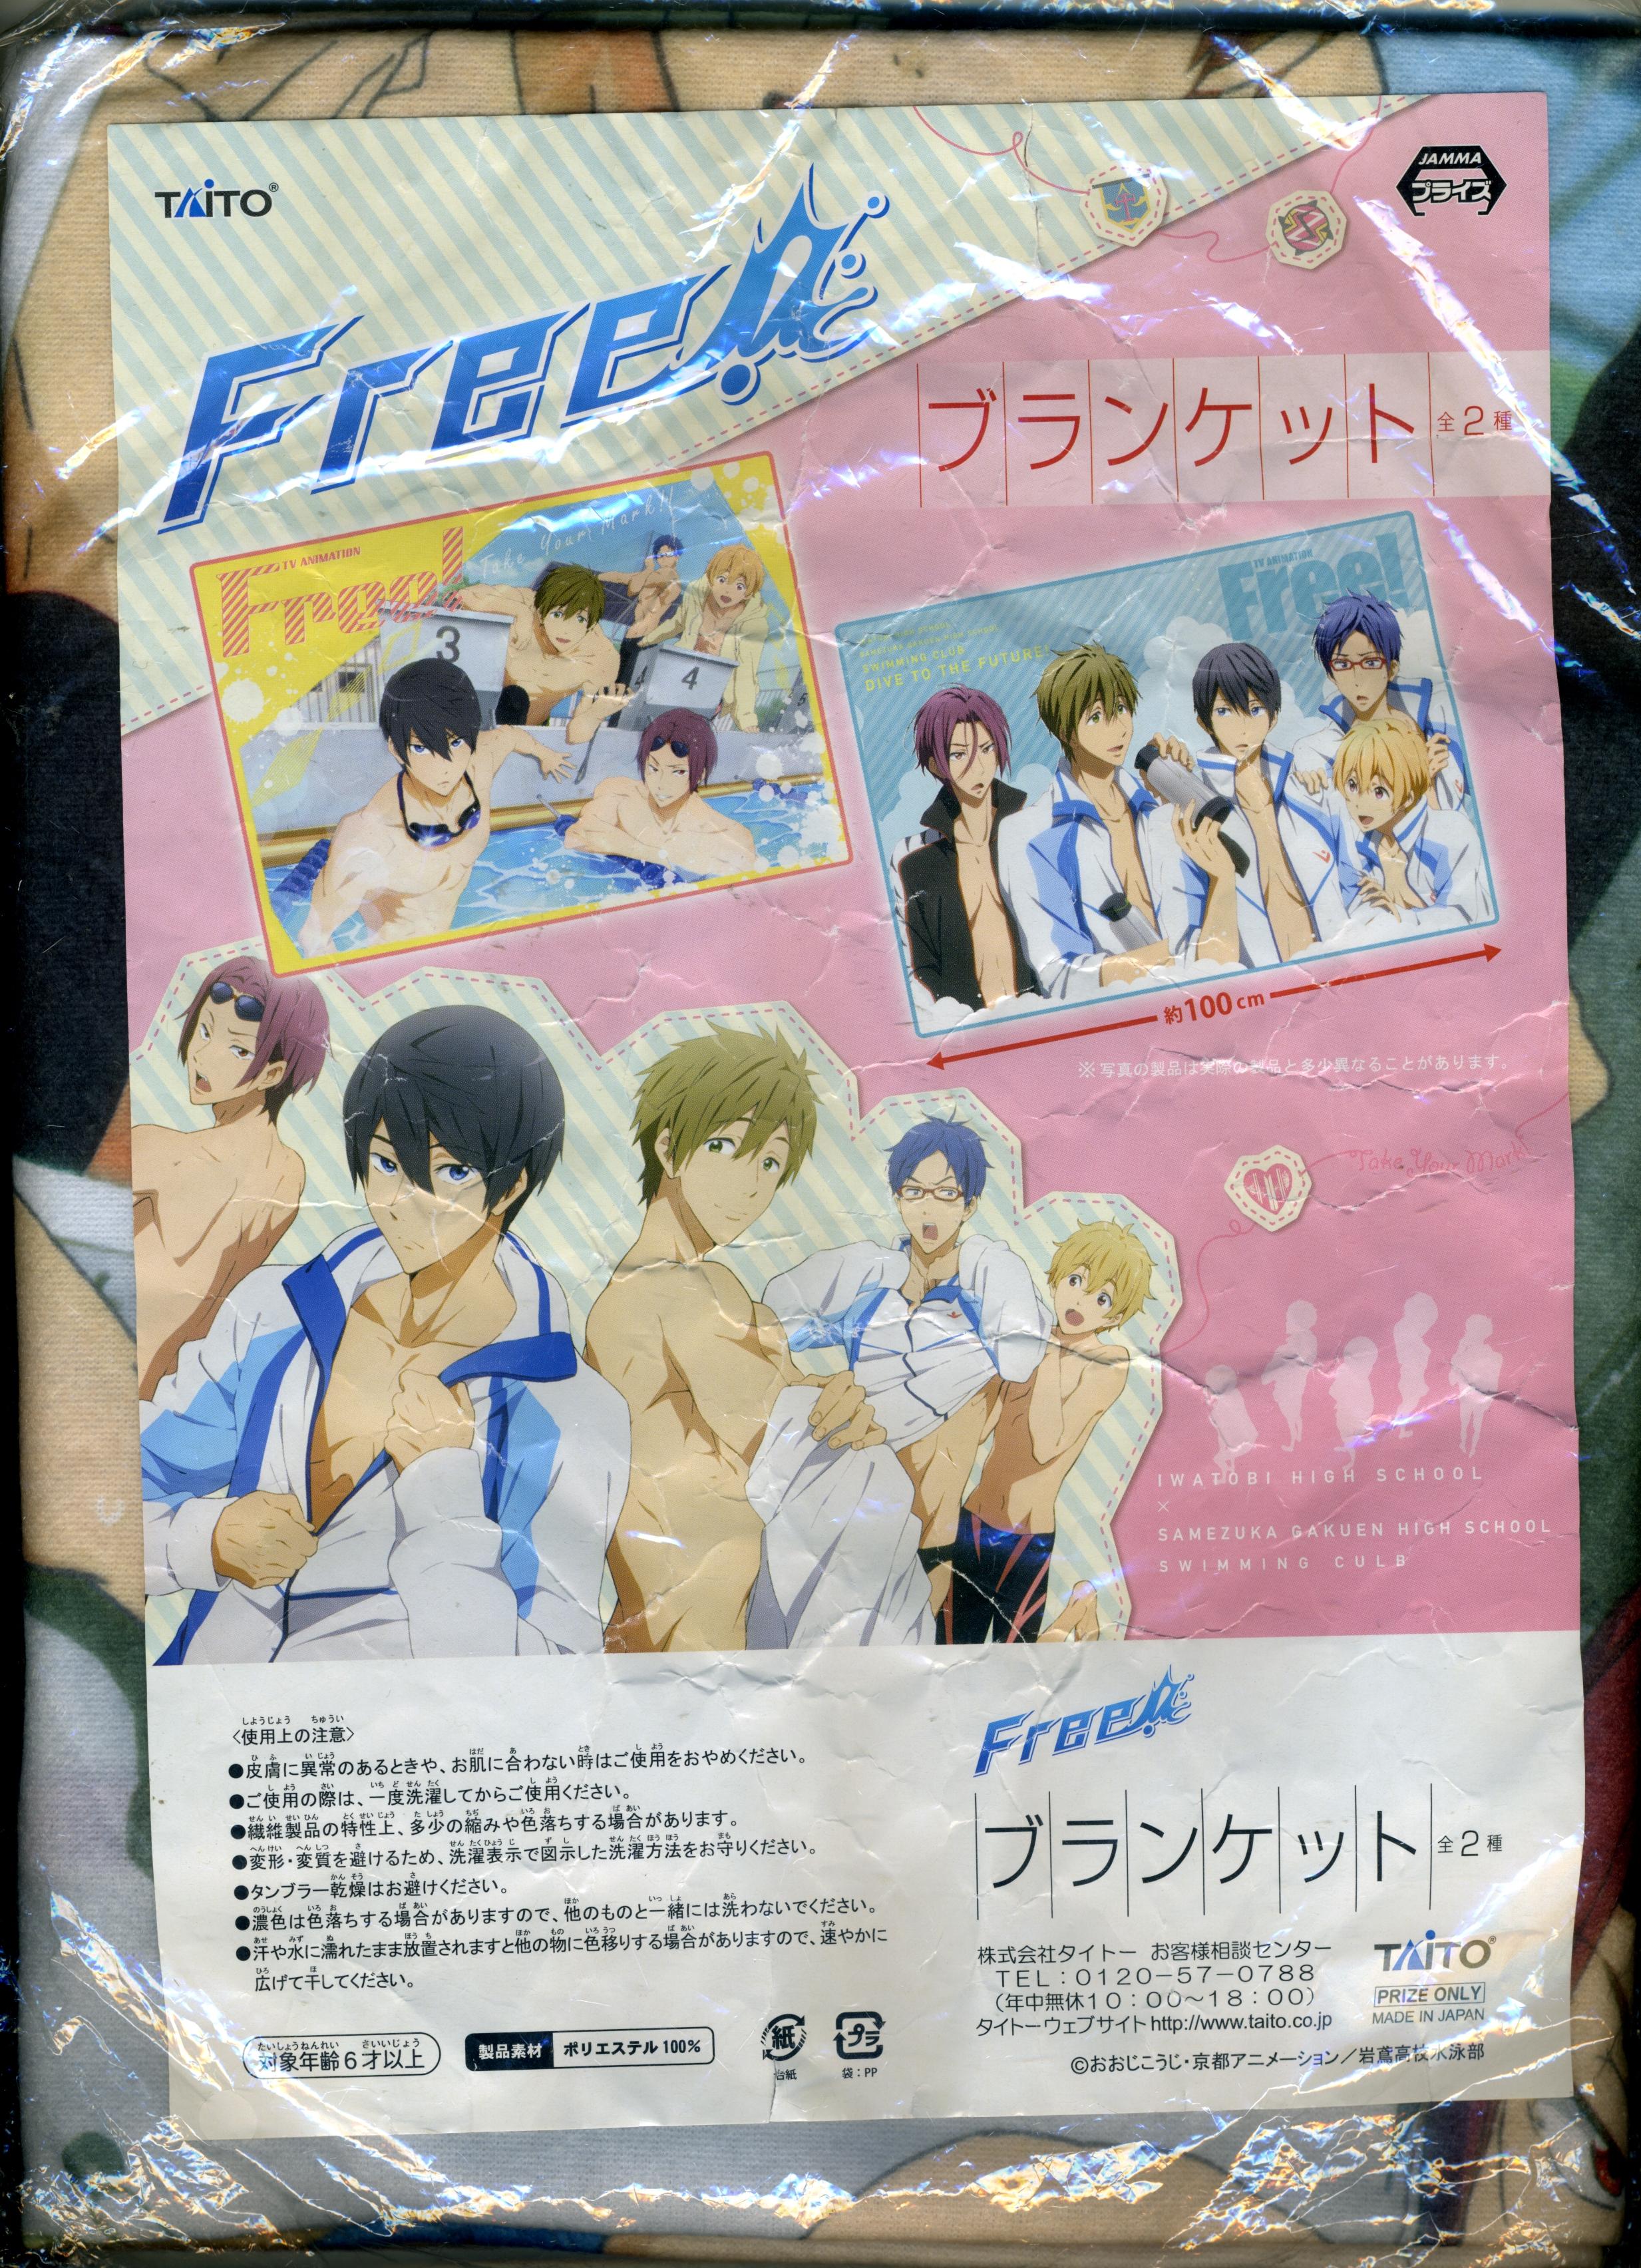 Taito, Free! Iwatobi High School Swim Club Blanket Prize Haruka, Makoto, Nagisa, Rei, Rin